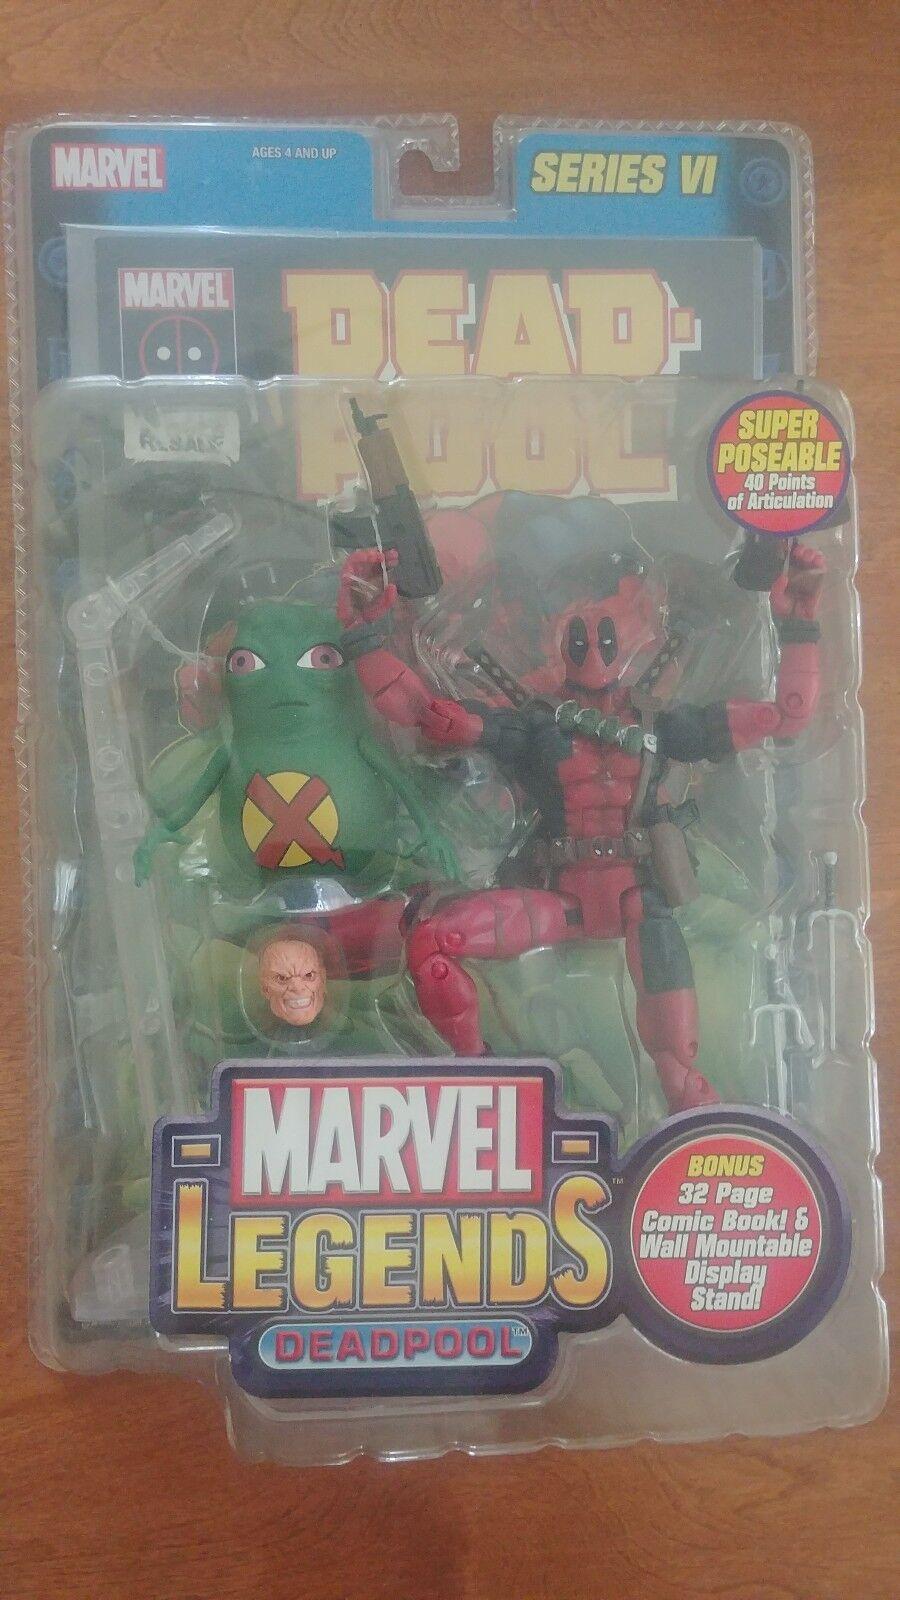 Marvel Legends: Deadpool  Toybiz Series VI 6 2004 New Sealed Action Figure